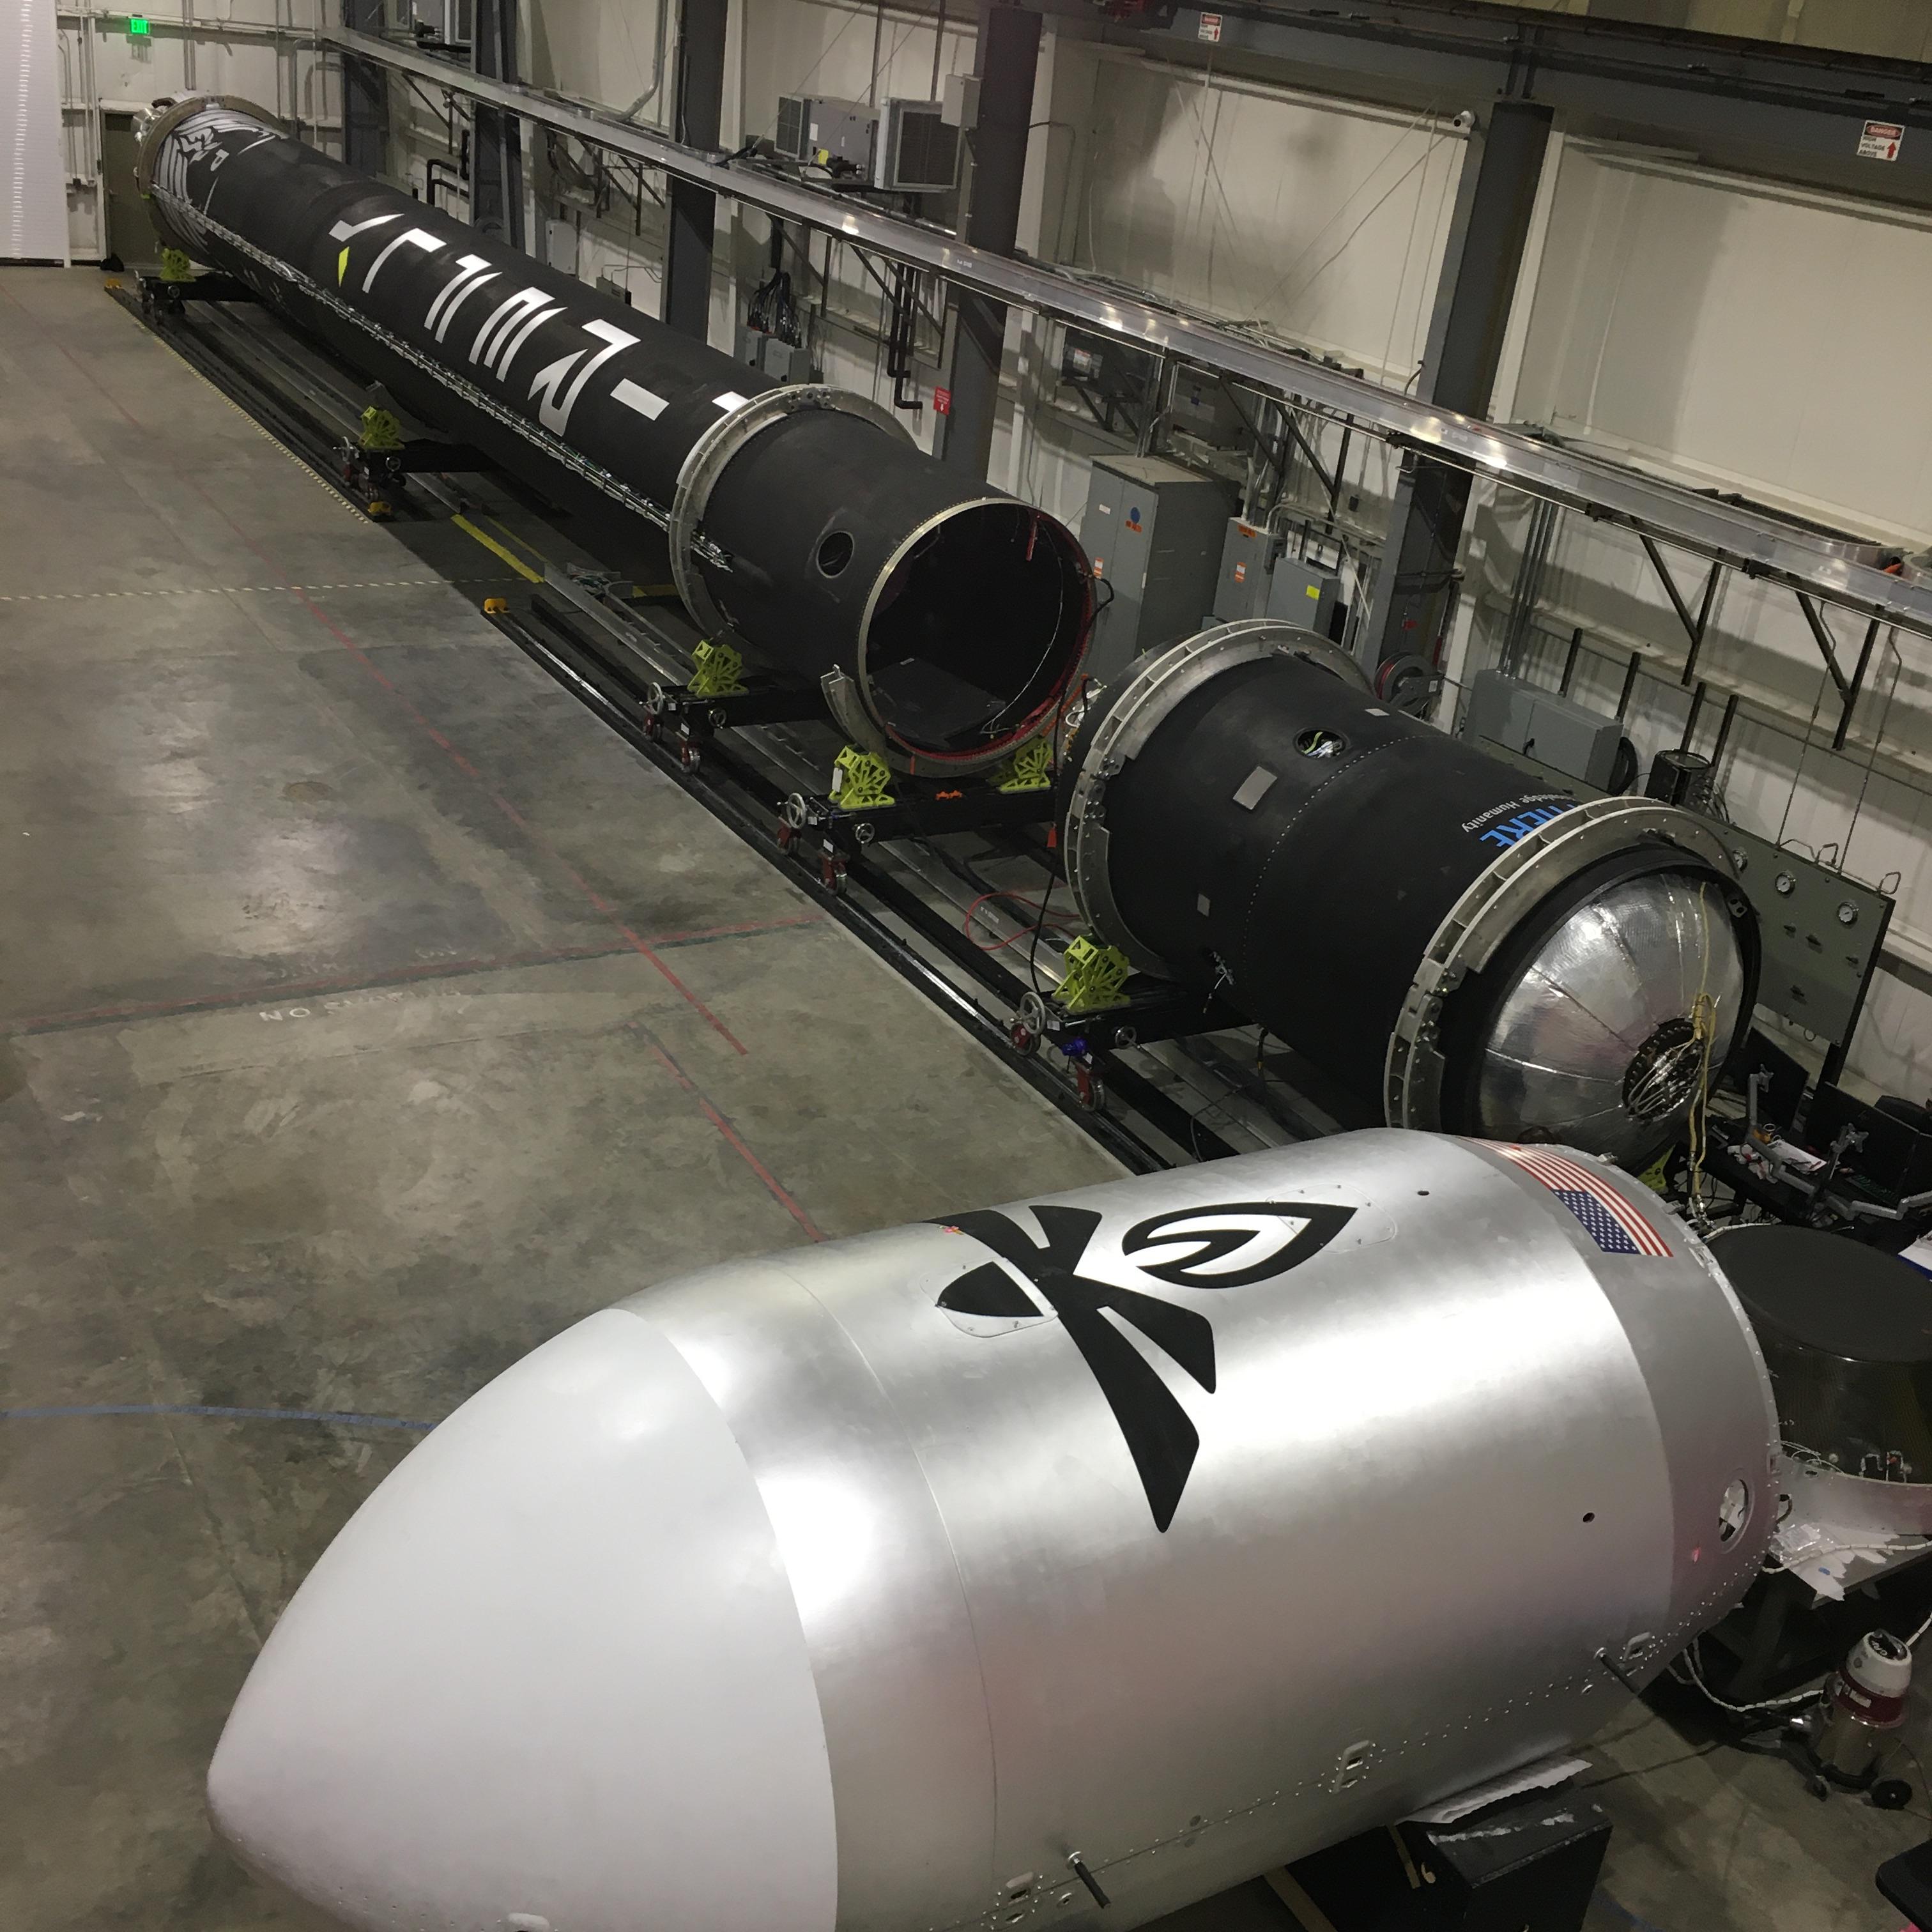 The Alpha rocket is shown before integration at Vandenberg Air Force Base.